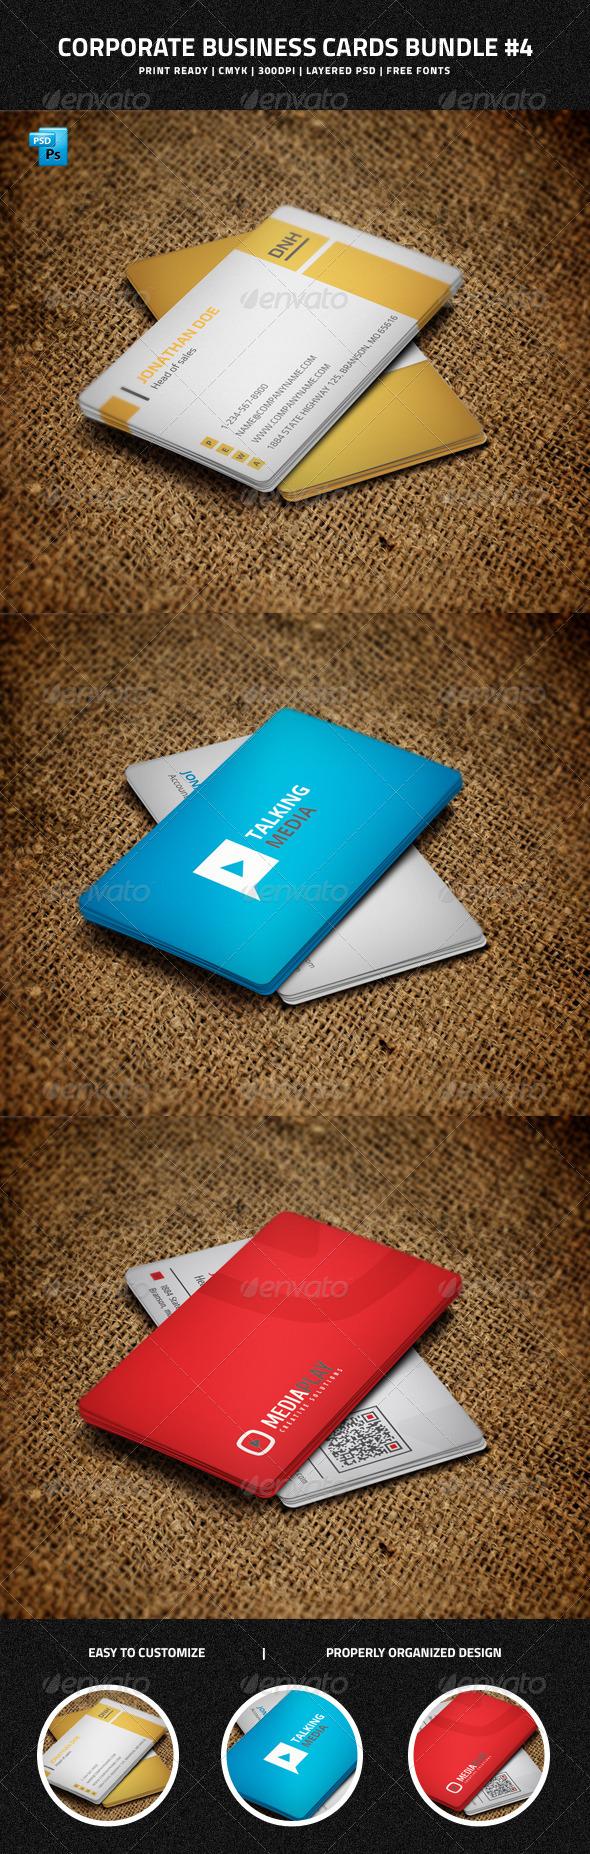 Corporate Business Cards Bundle #4 - Corporate Business Cards